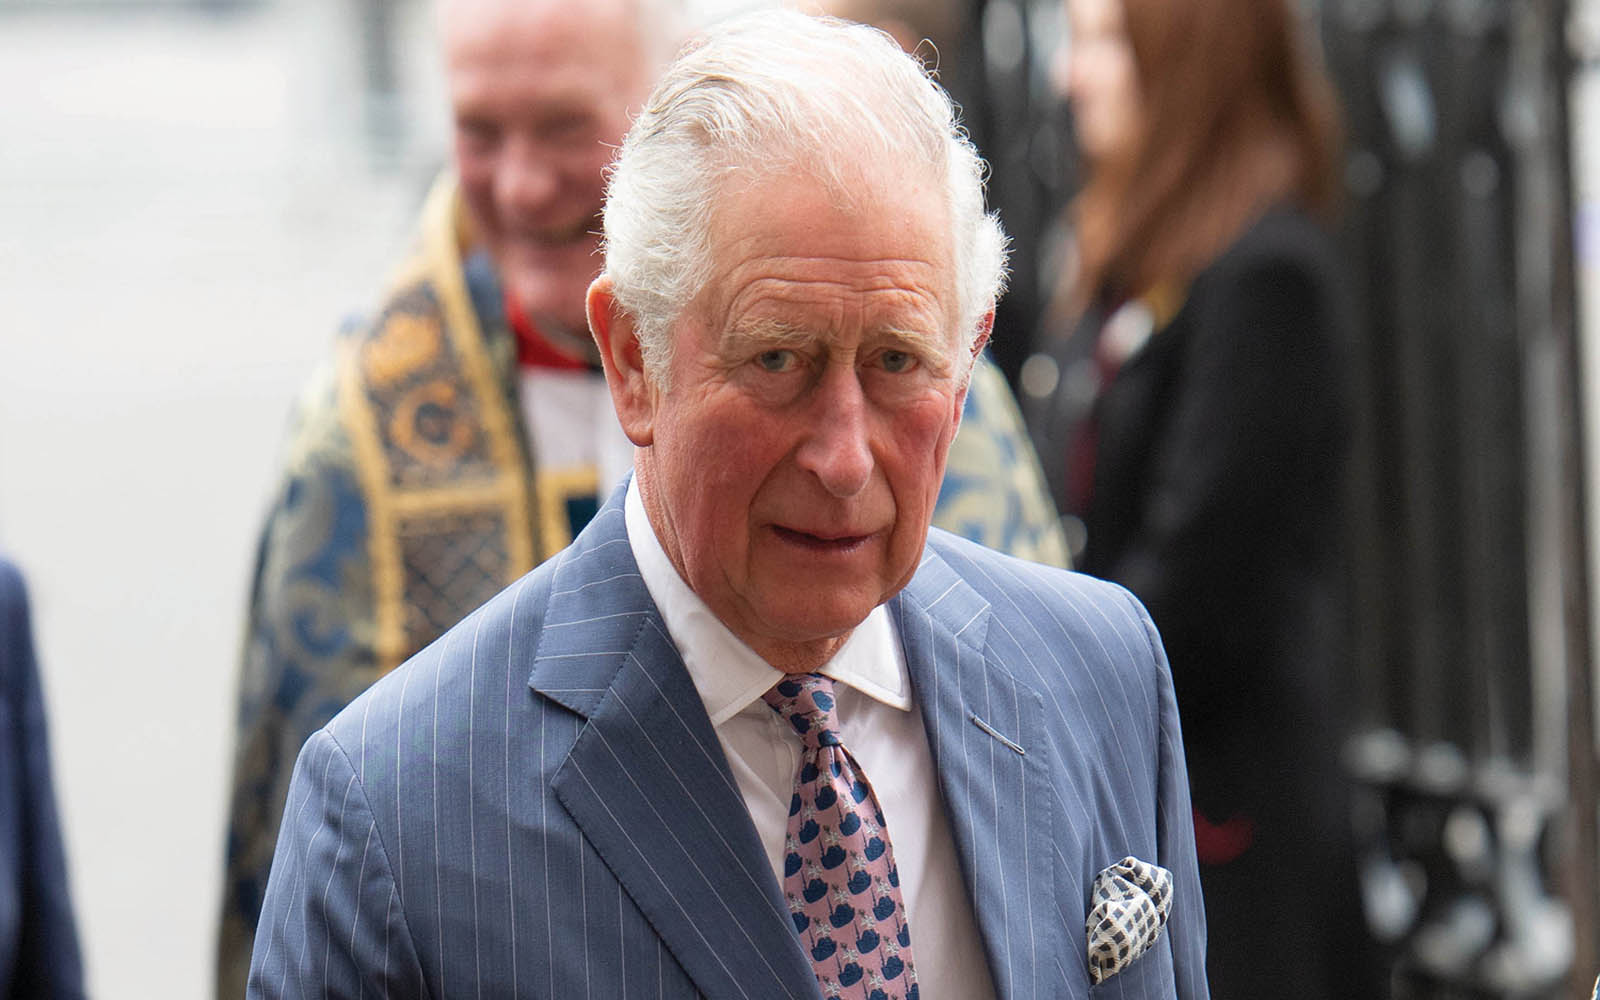 Anthony Joshua self-isolating after meeting Prince Charles before coronavirus diagnosis